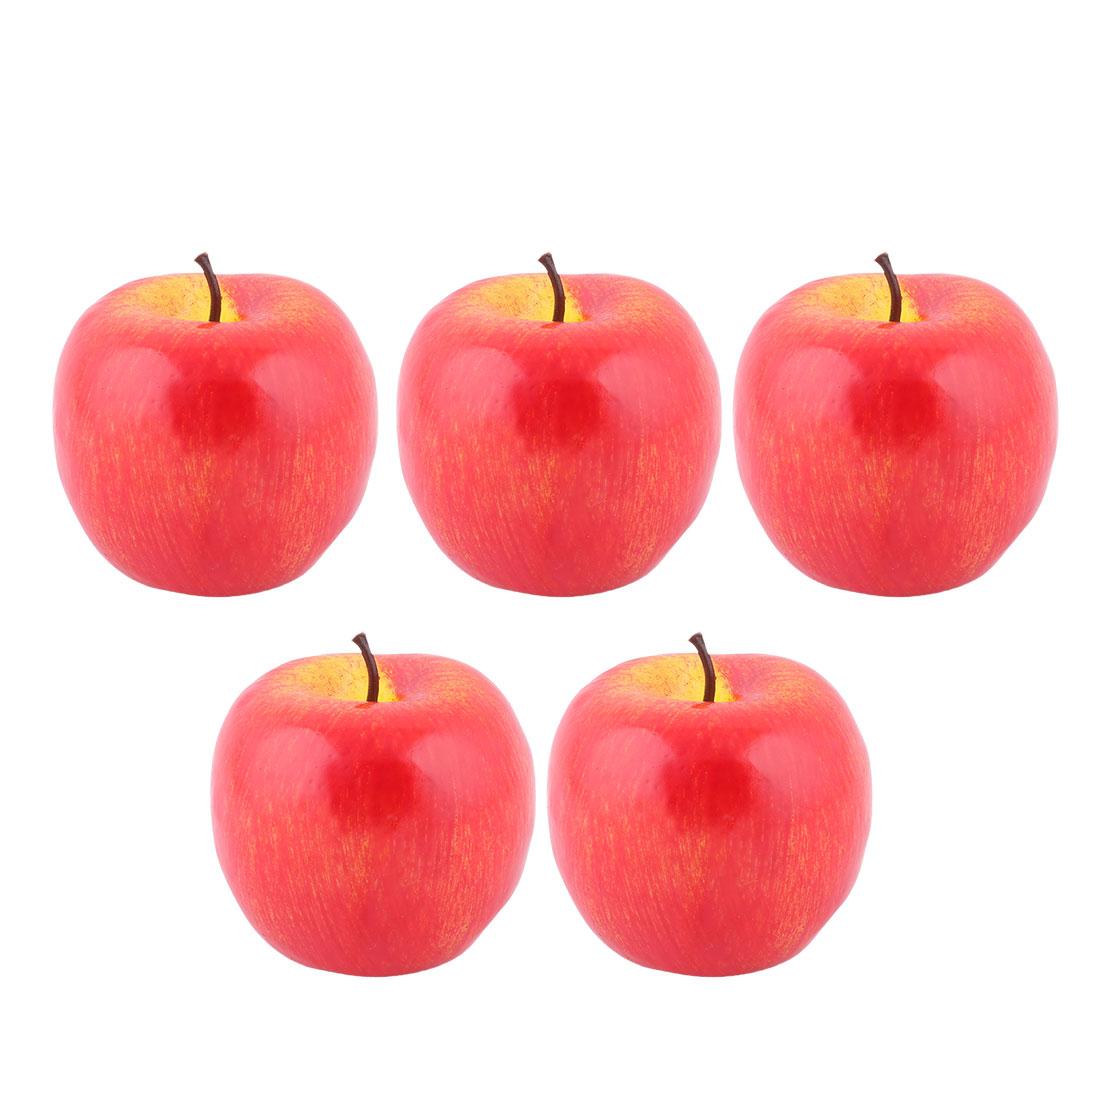 House Table Decor Foam Artificial Apple Designed Emulation Fruit Mold Red 5pcs